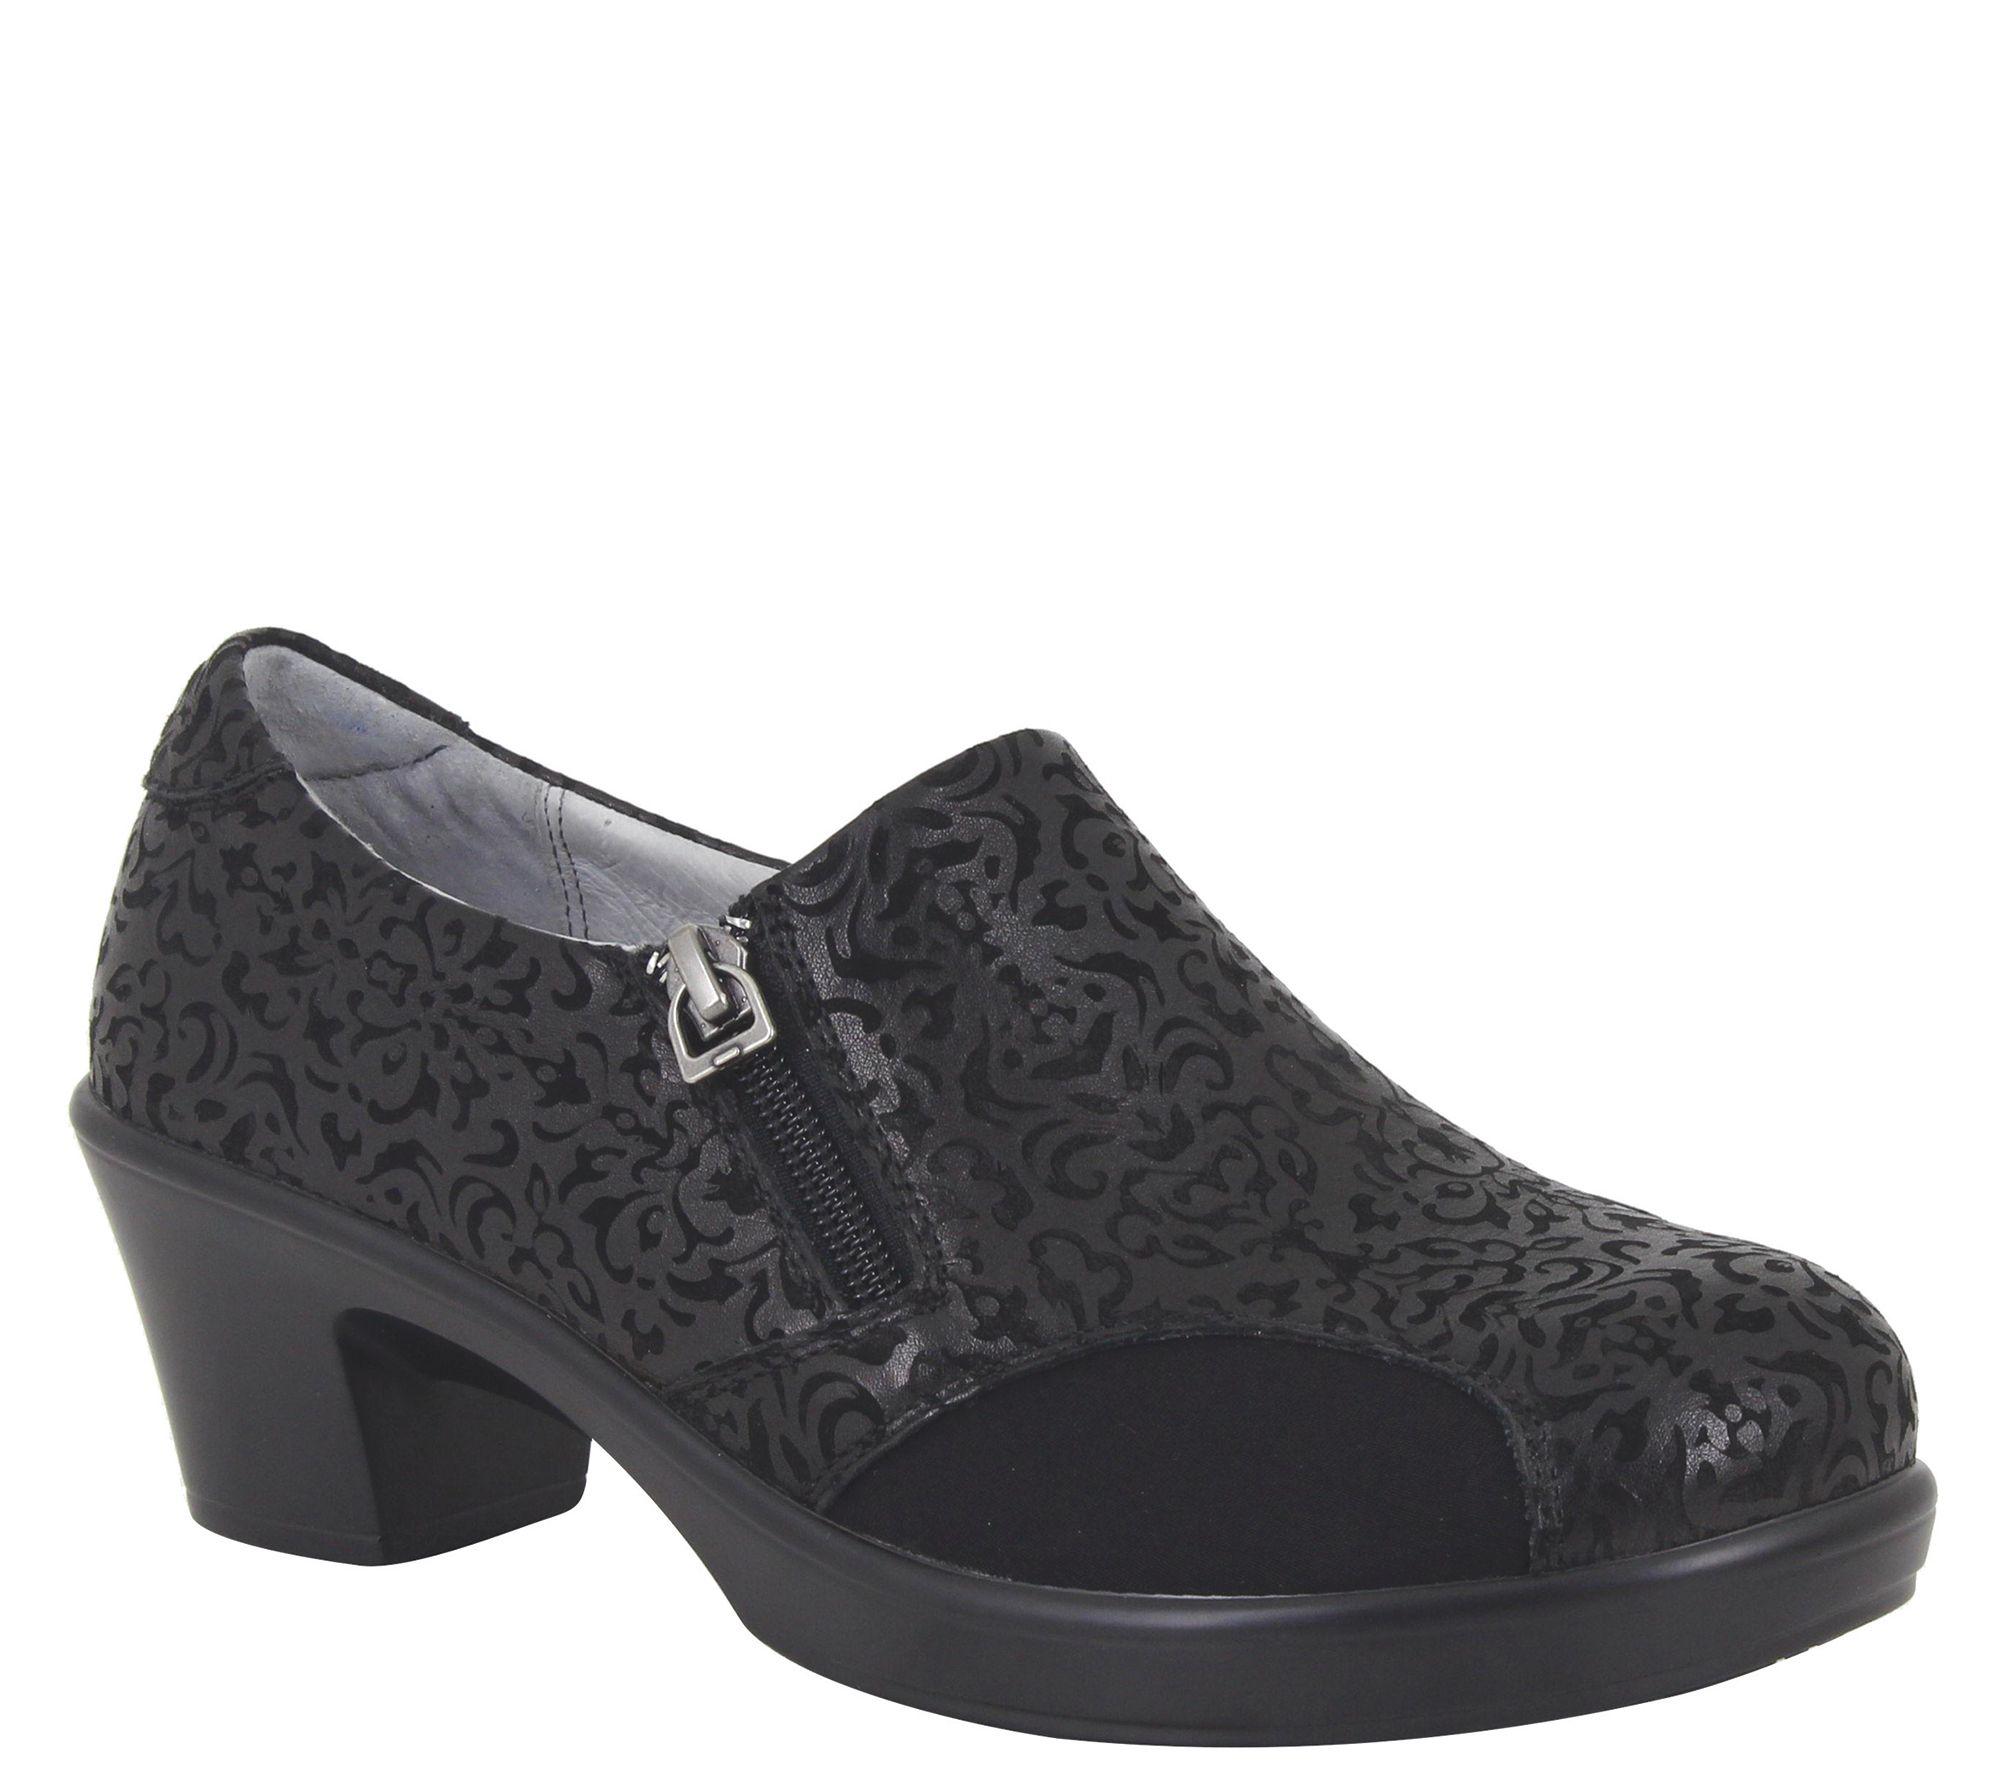 4fafb7f62857bc Alegria Leather Slip-on Comfortable Heels -Hayli - Page 1 — QVC.com